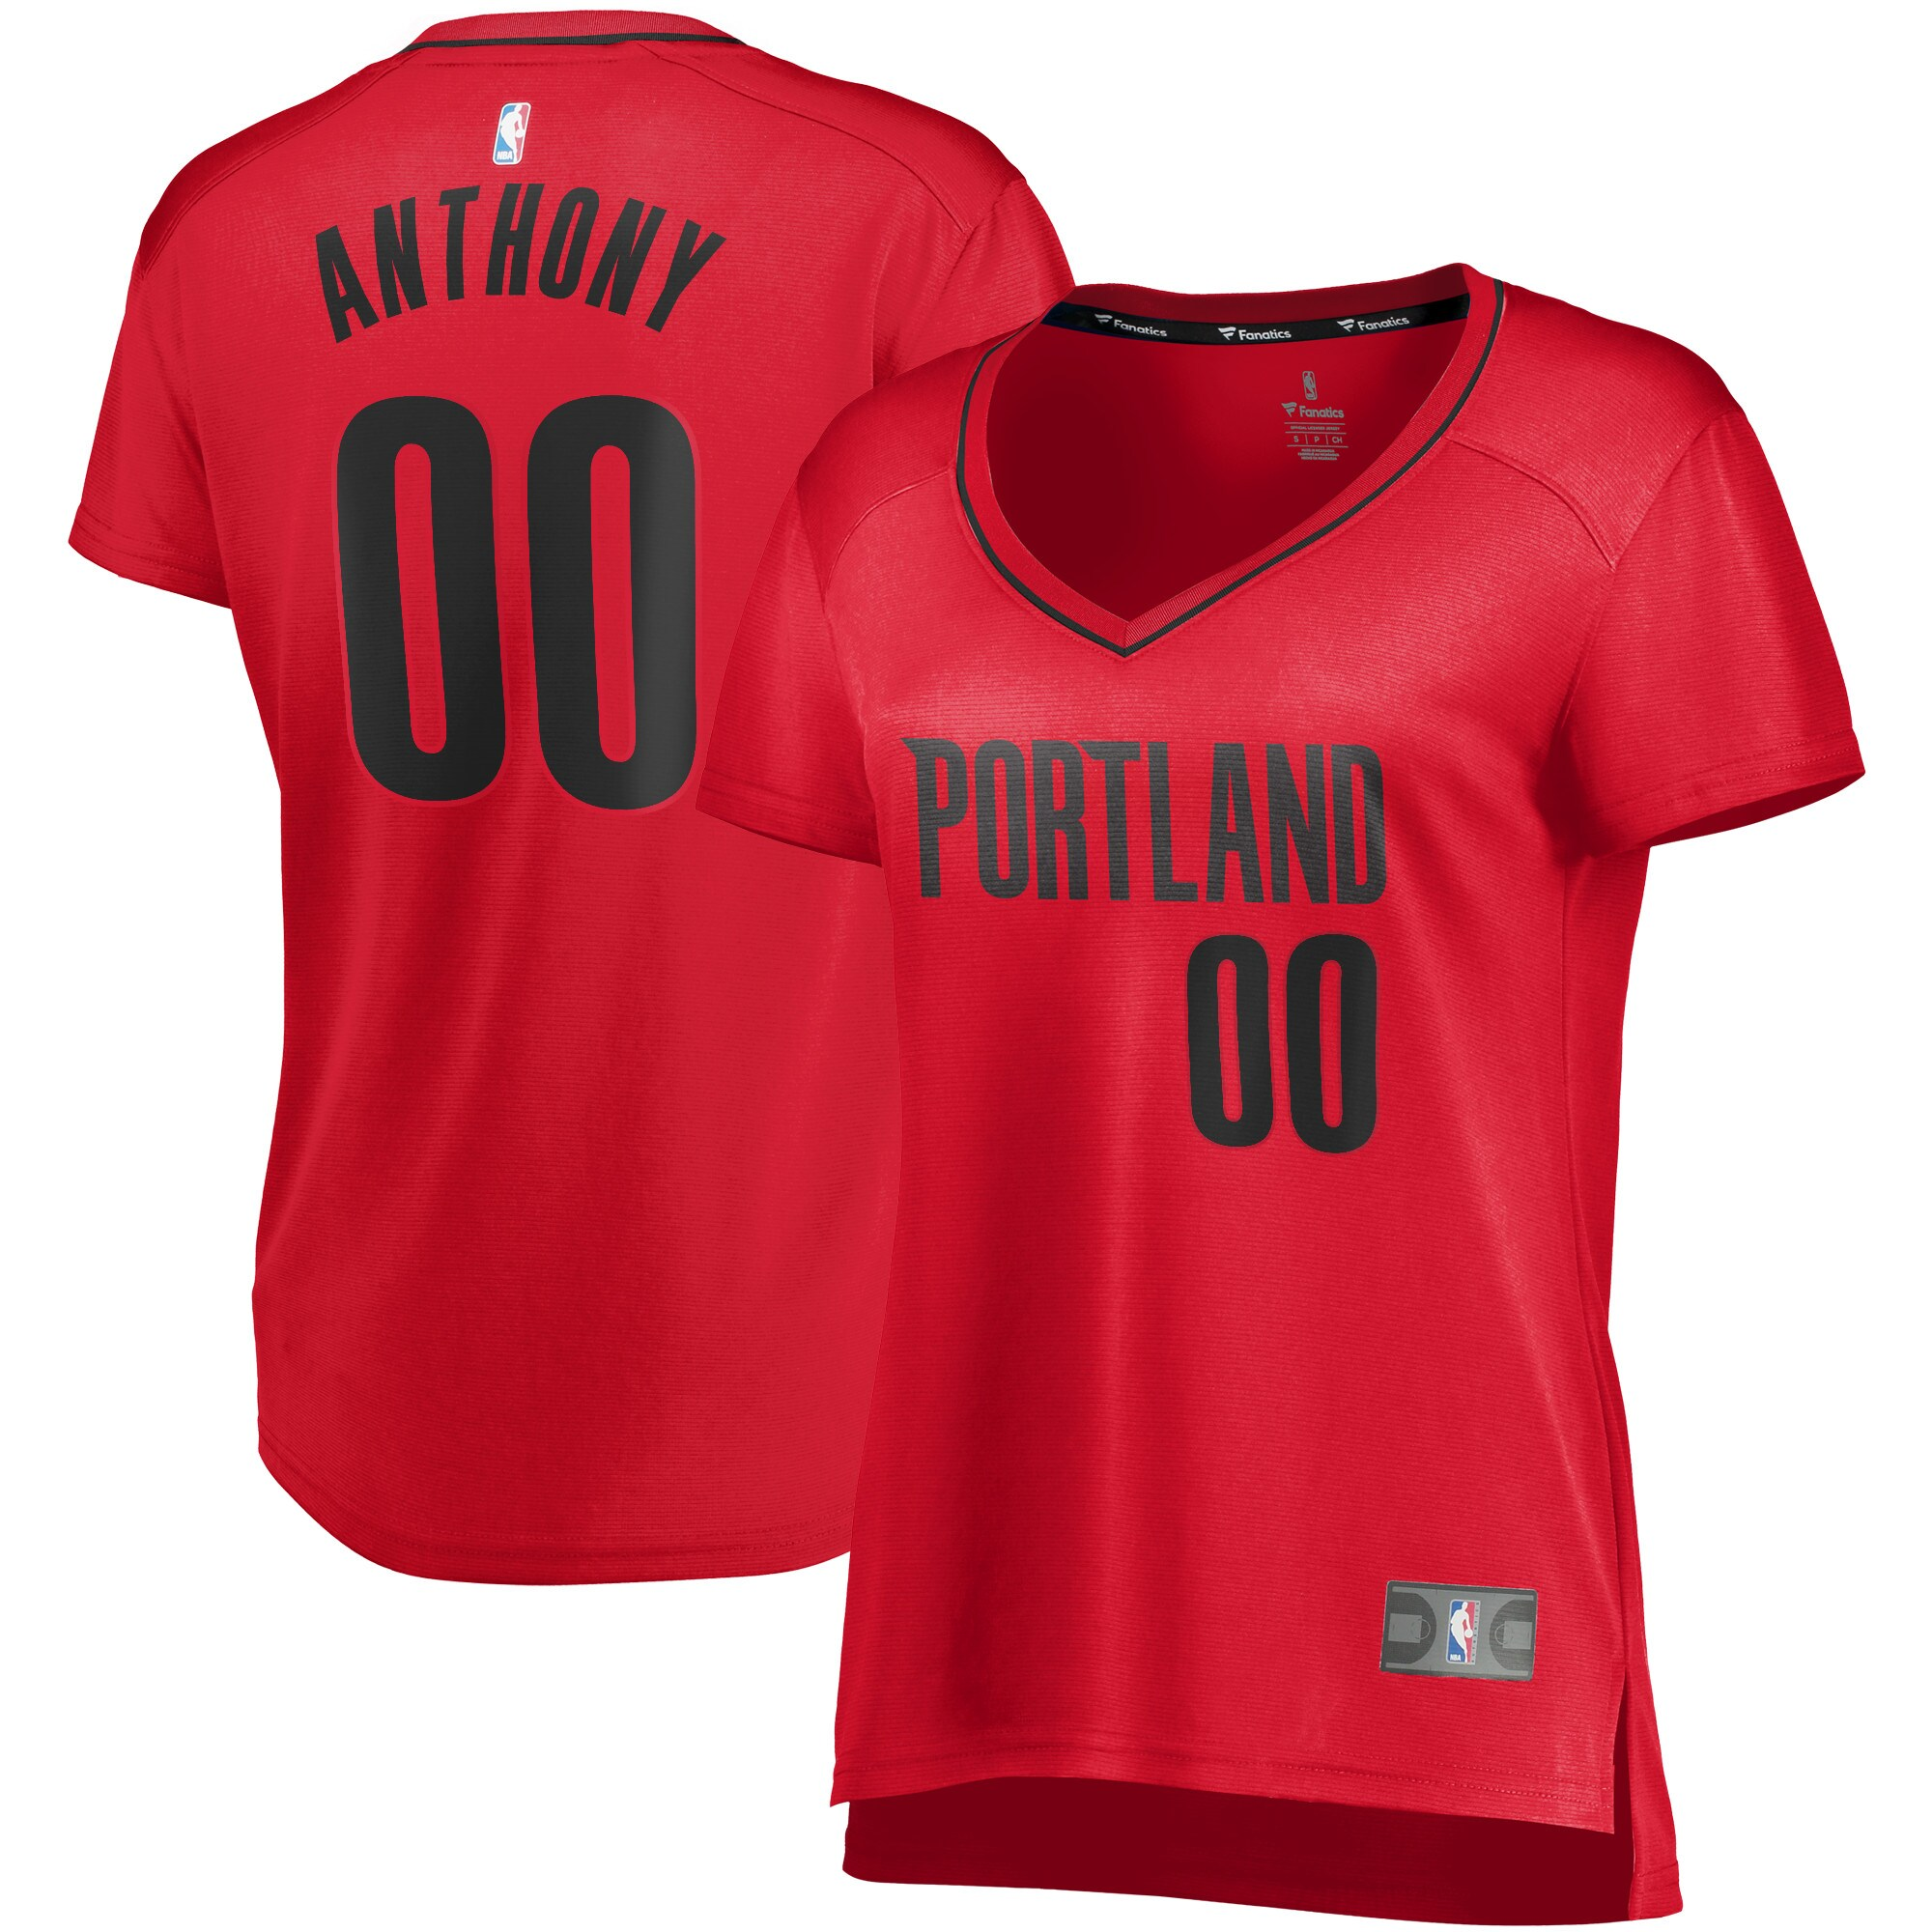 Carmelo Anthony Portland Trail Blazers Fanatics Branded Women's 2019/20 Fast Break Replica Player Jersey Red - Statement Edition